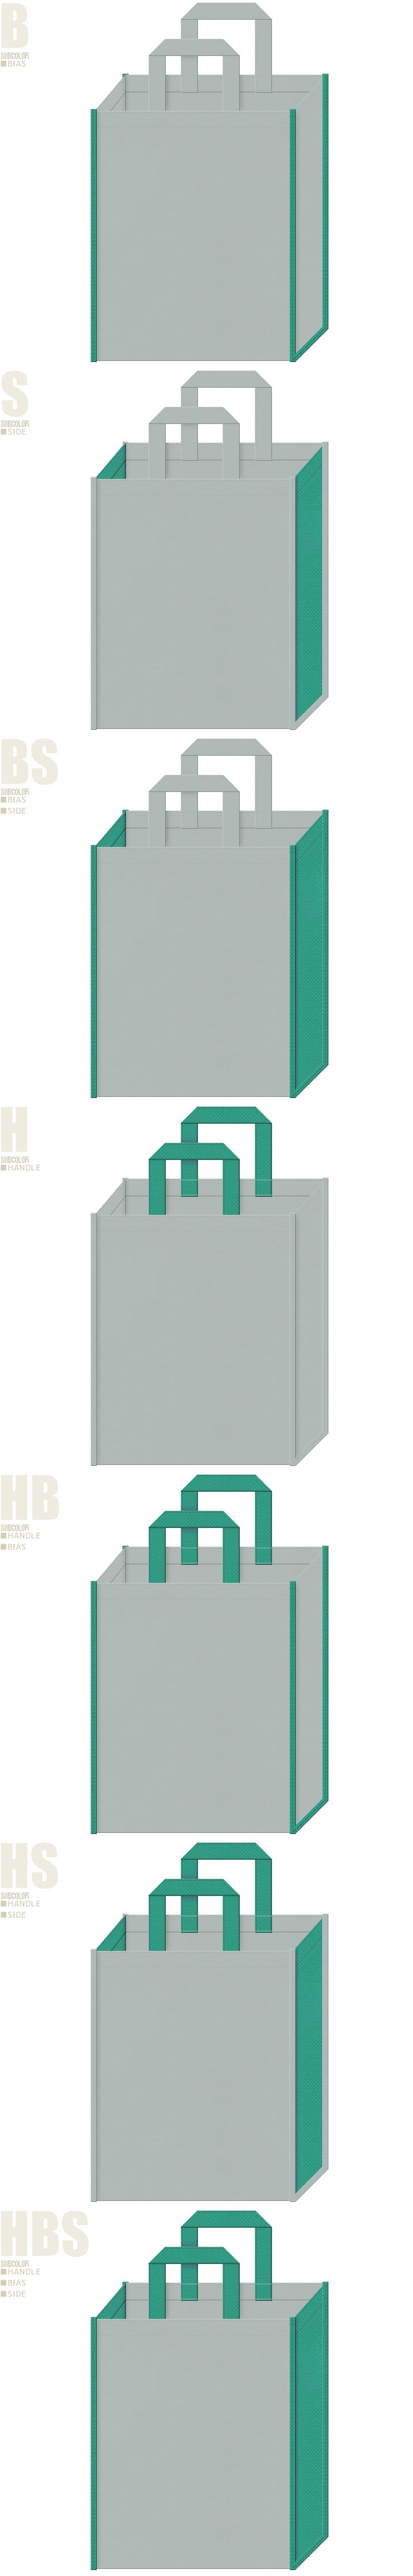 CO2削減・緑化地域・緑化コンクリート・屋上緑化・壁面緑化・建築・設計・エクステリアの展示会用バッグにお奨めの不織布バッグデザイン:グレー色と青緑色の配色7パターン。